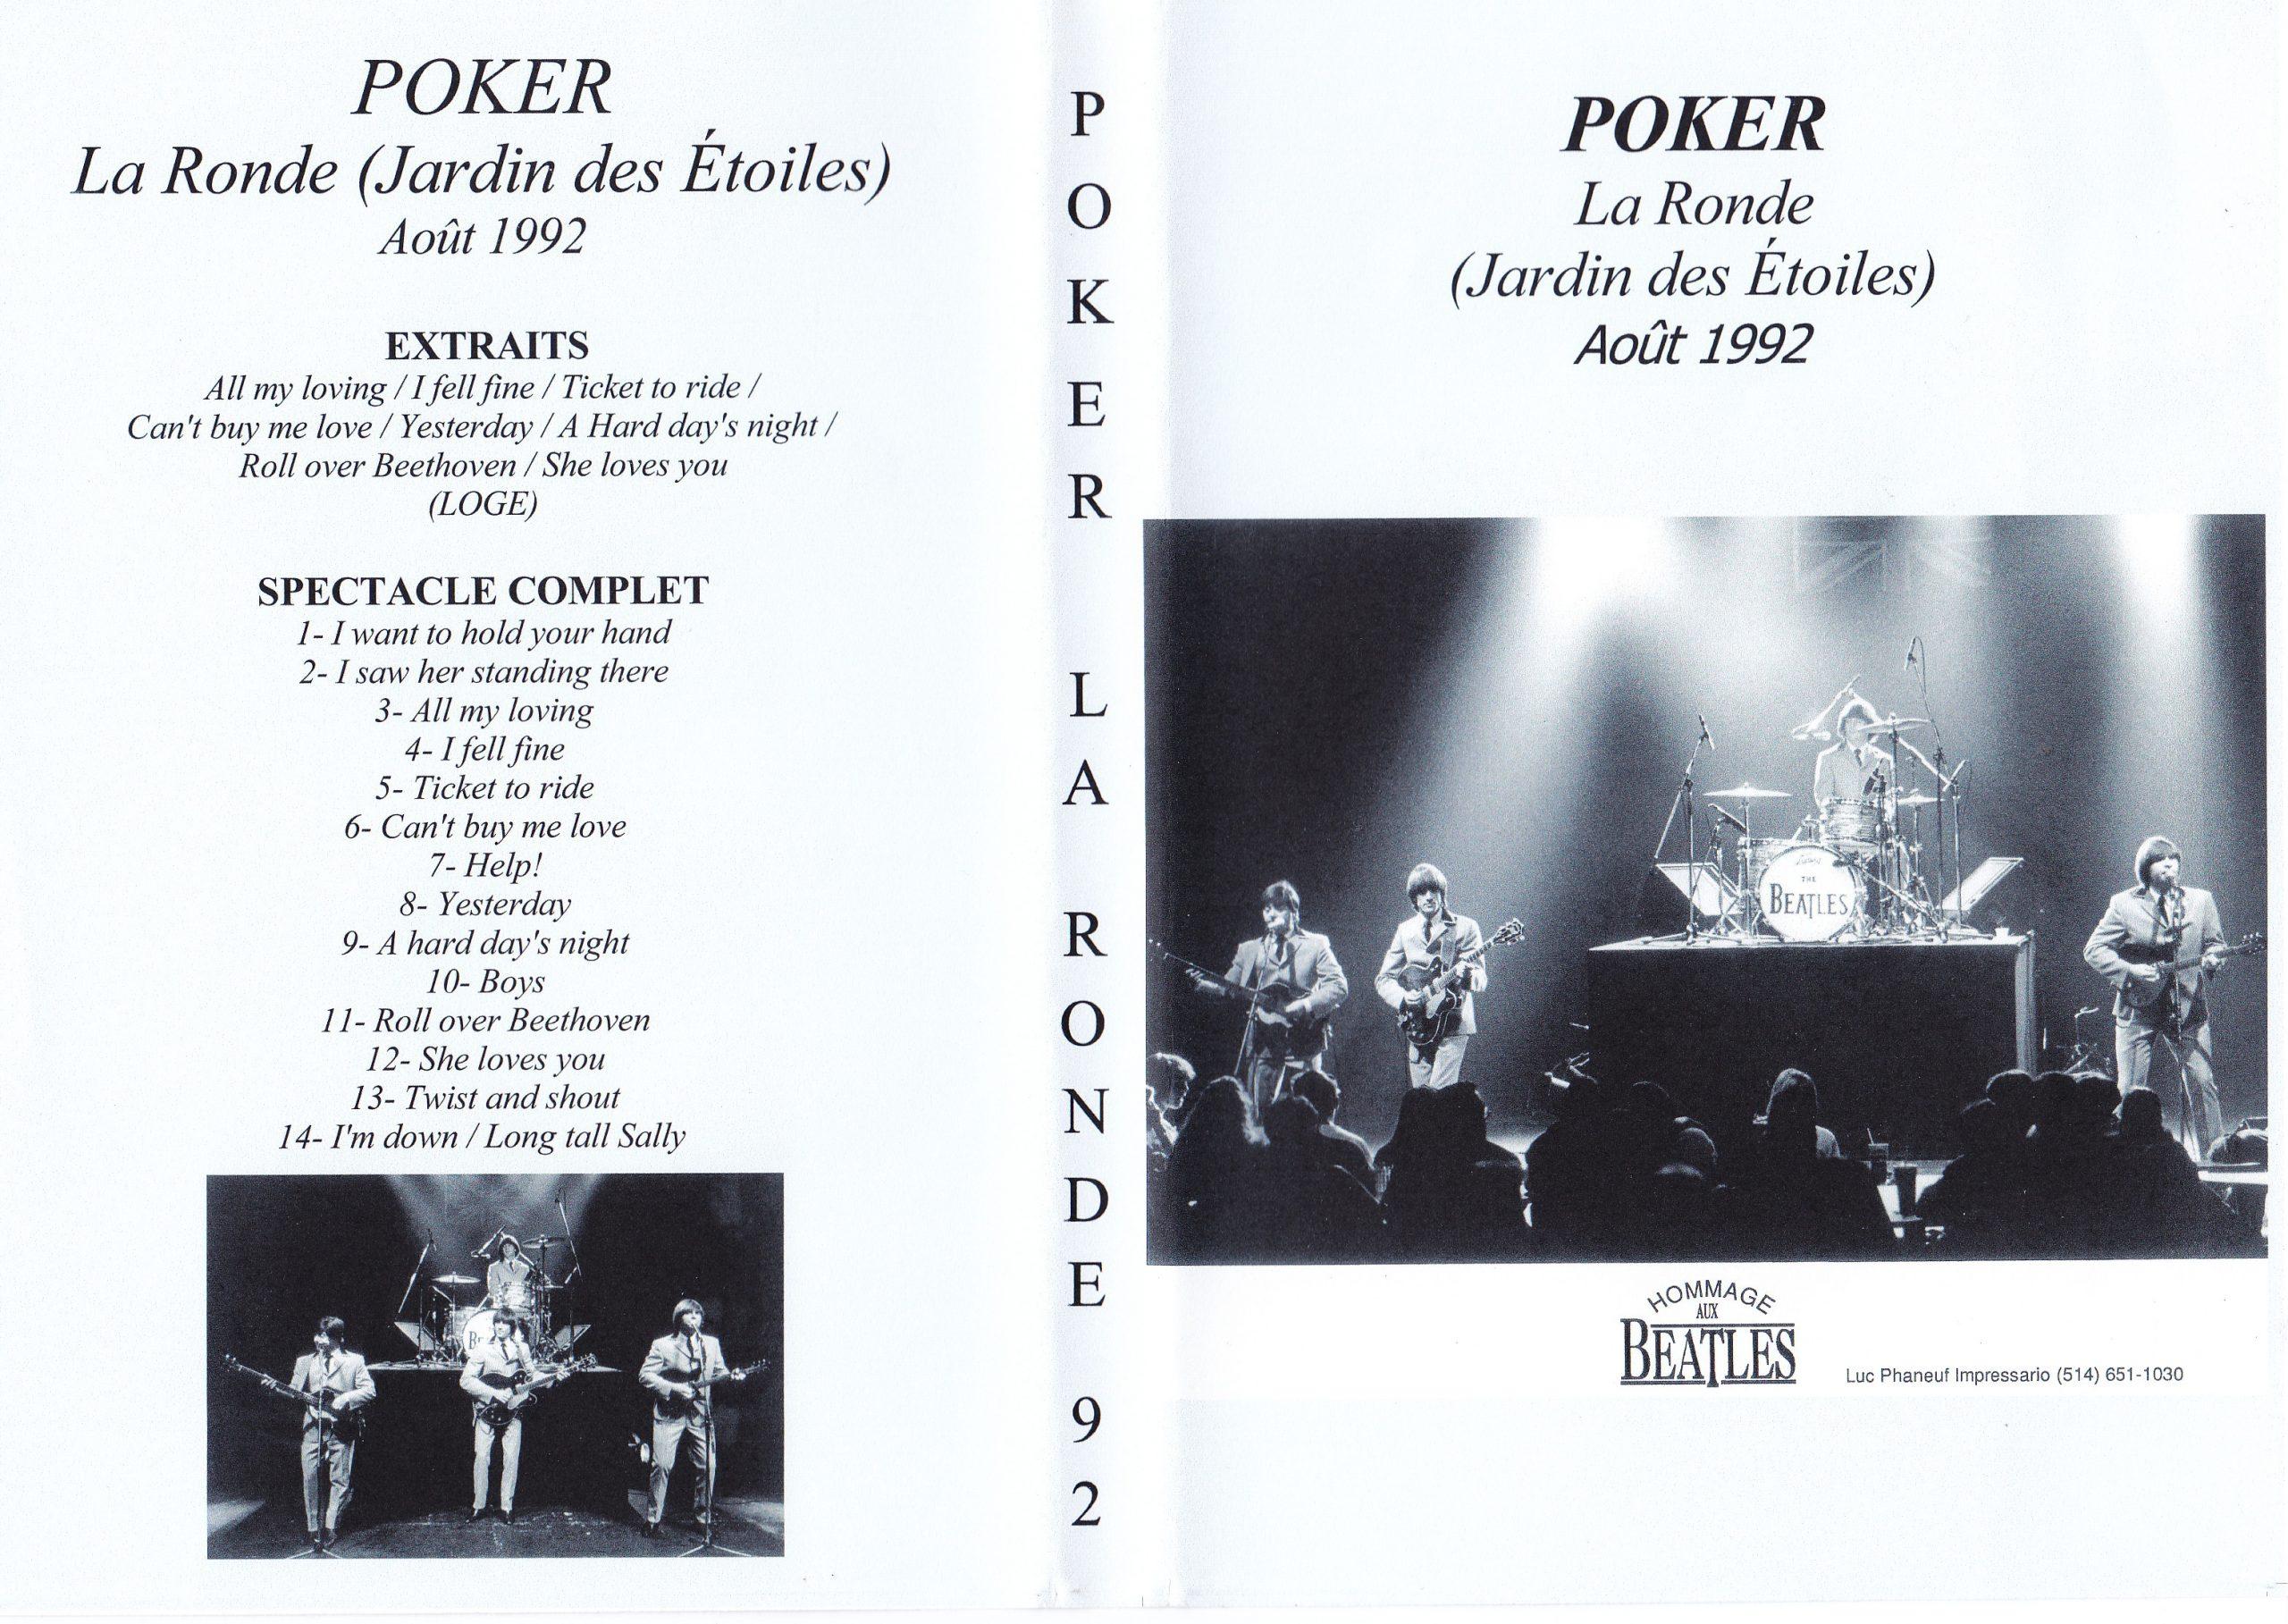 1992-Poker-la-ronde